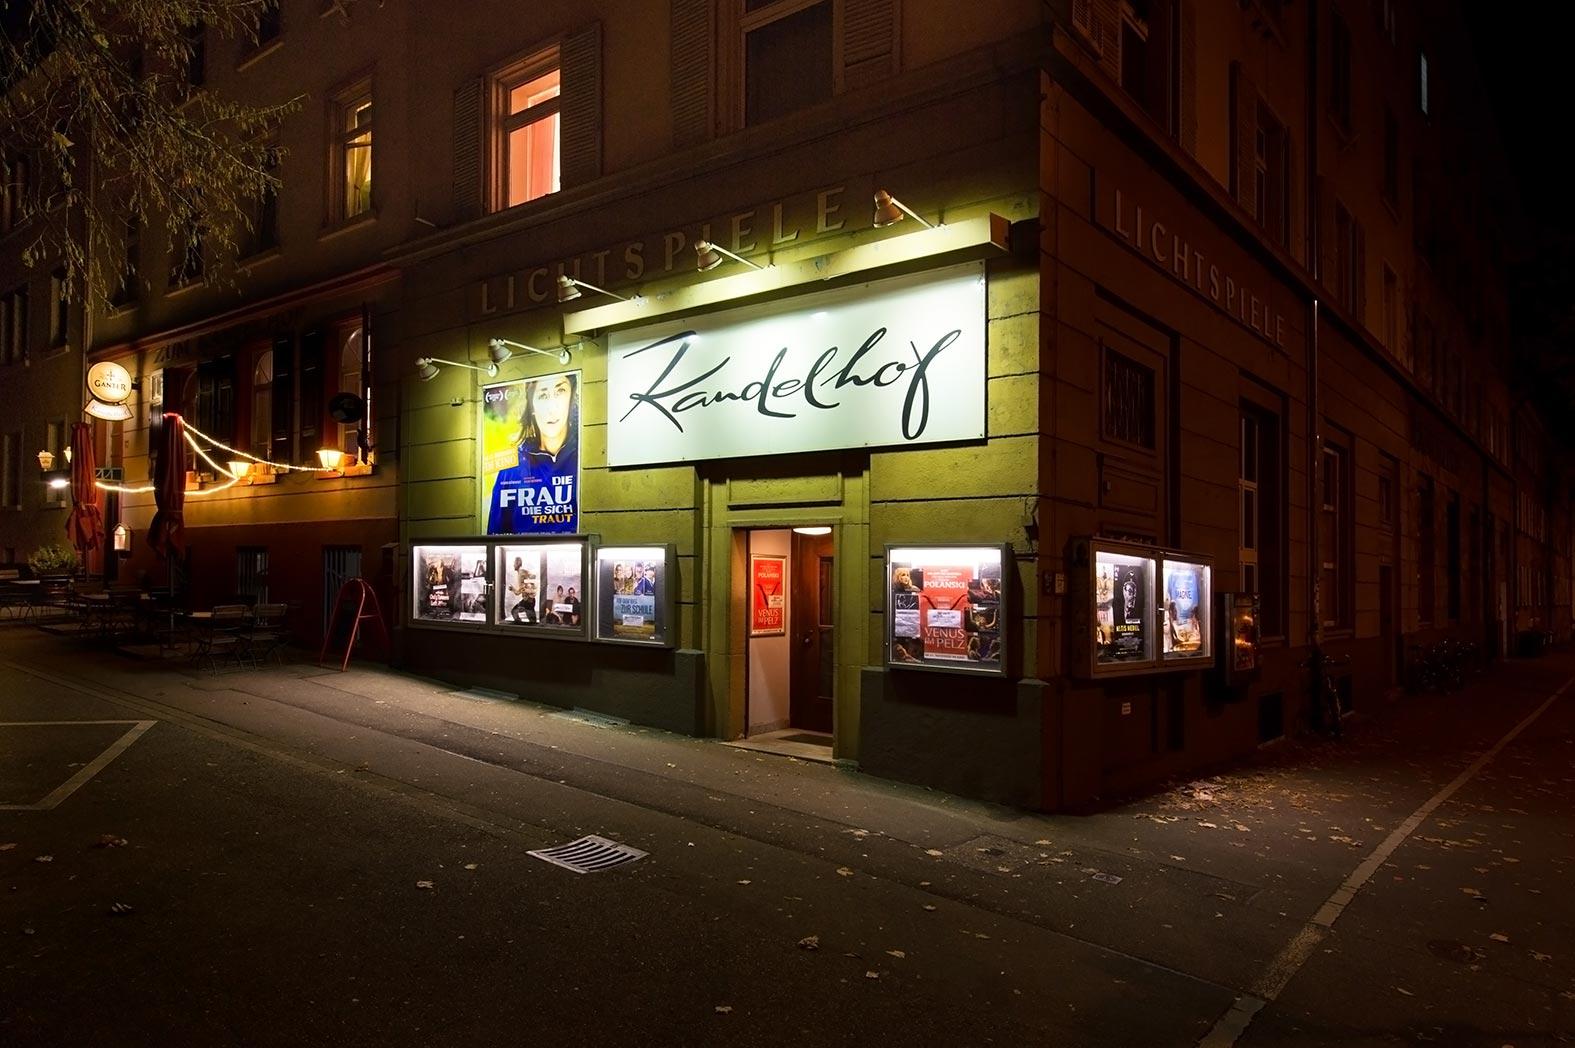 Kandelhof - Lichtspiele